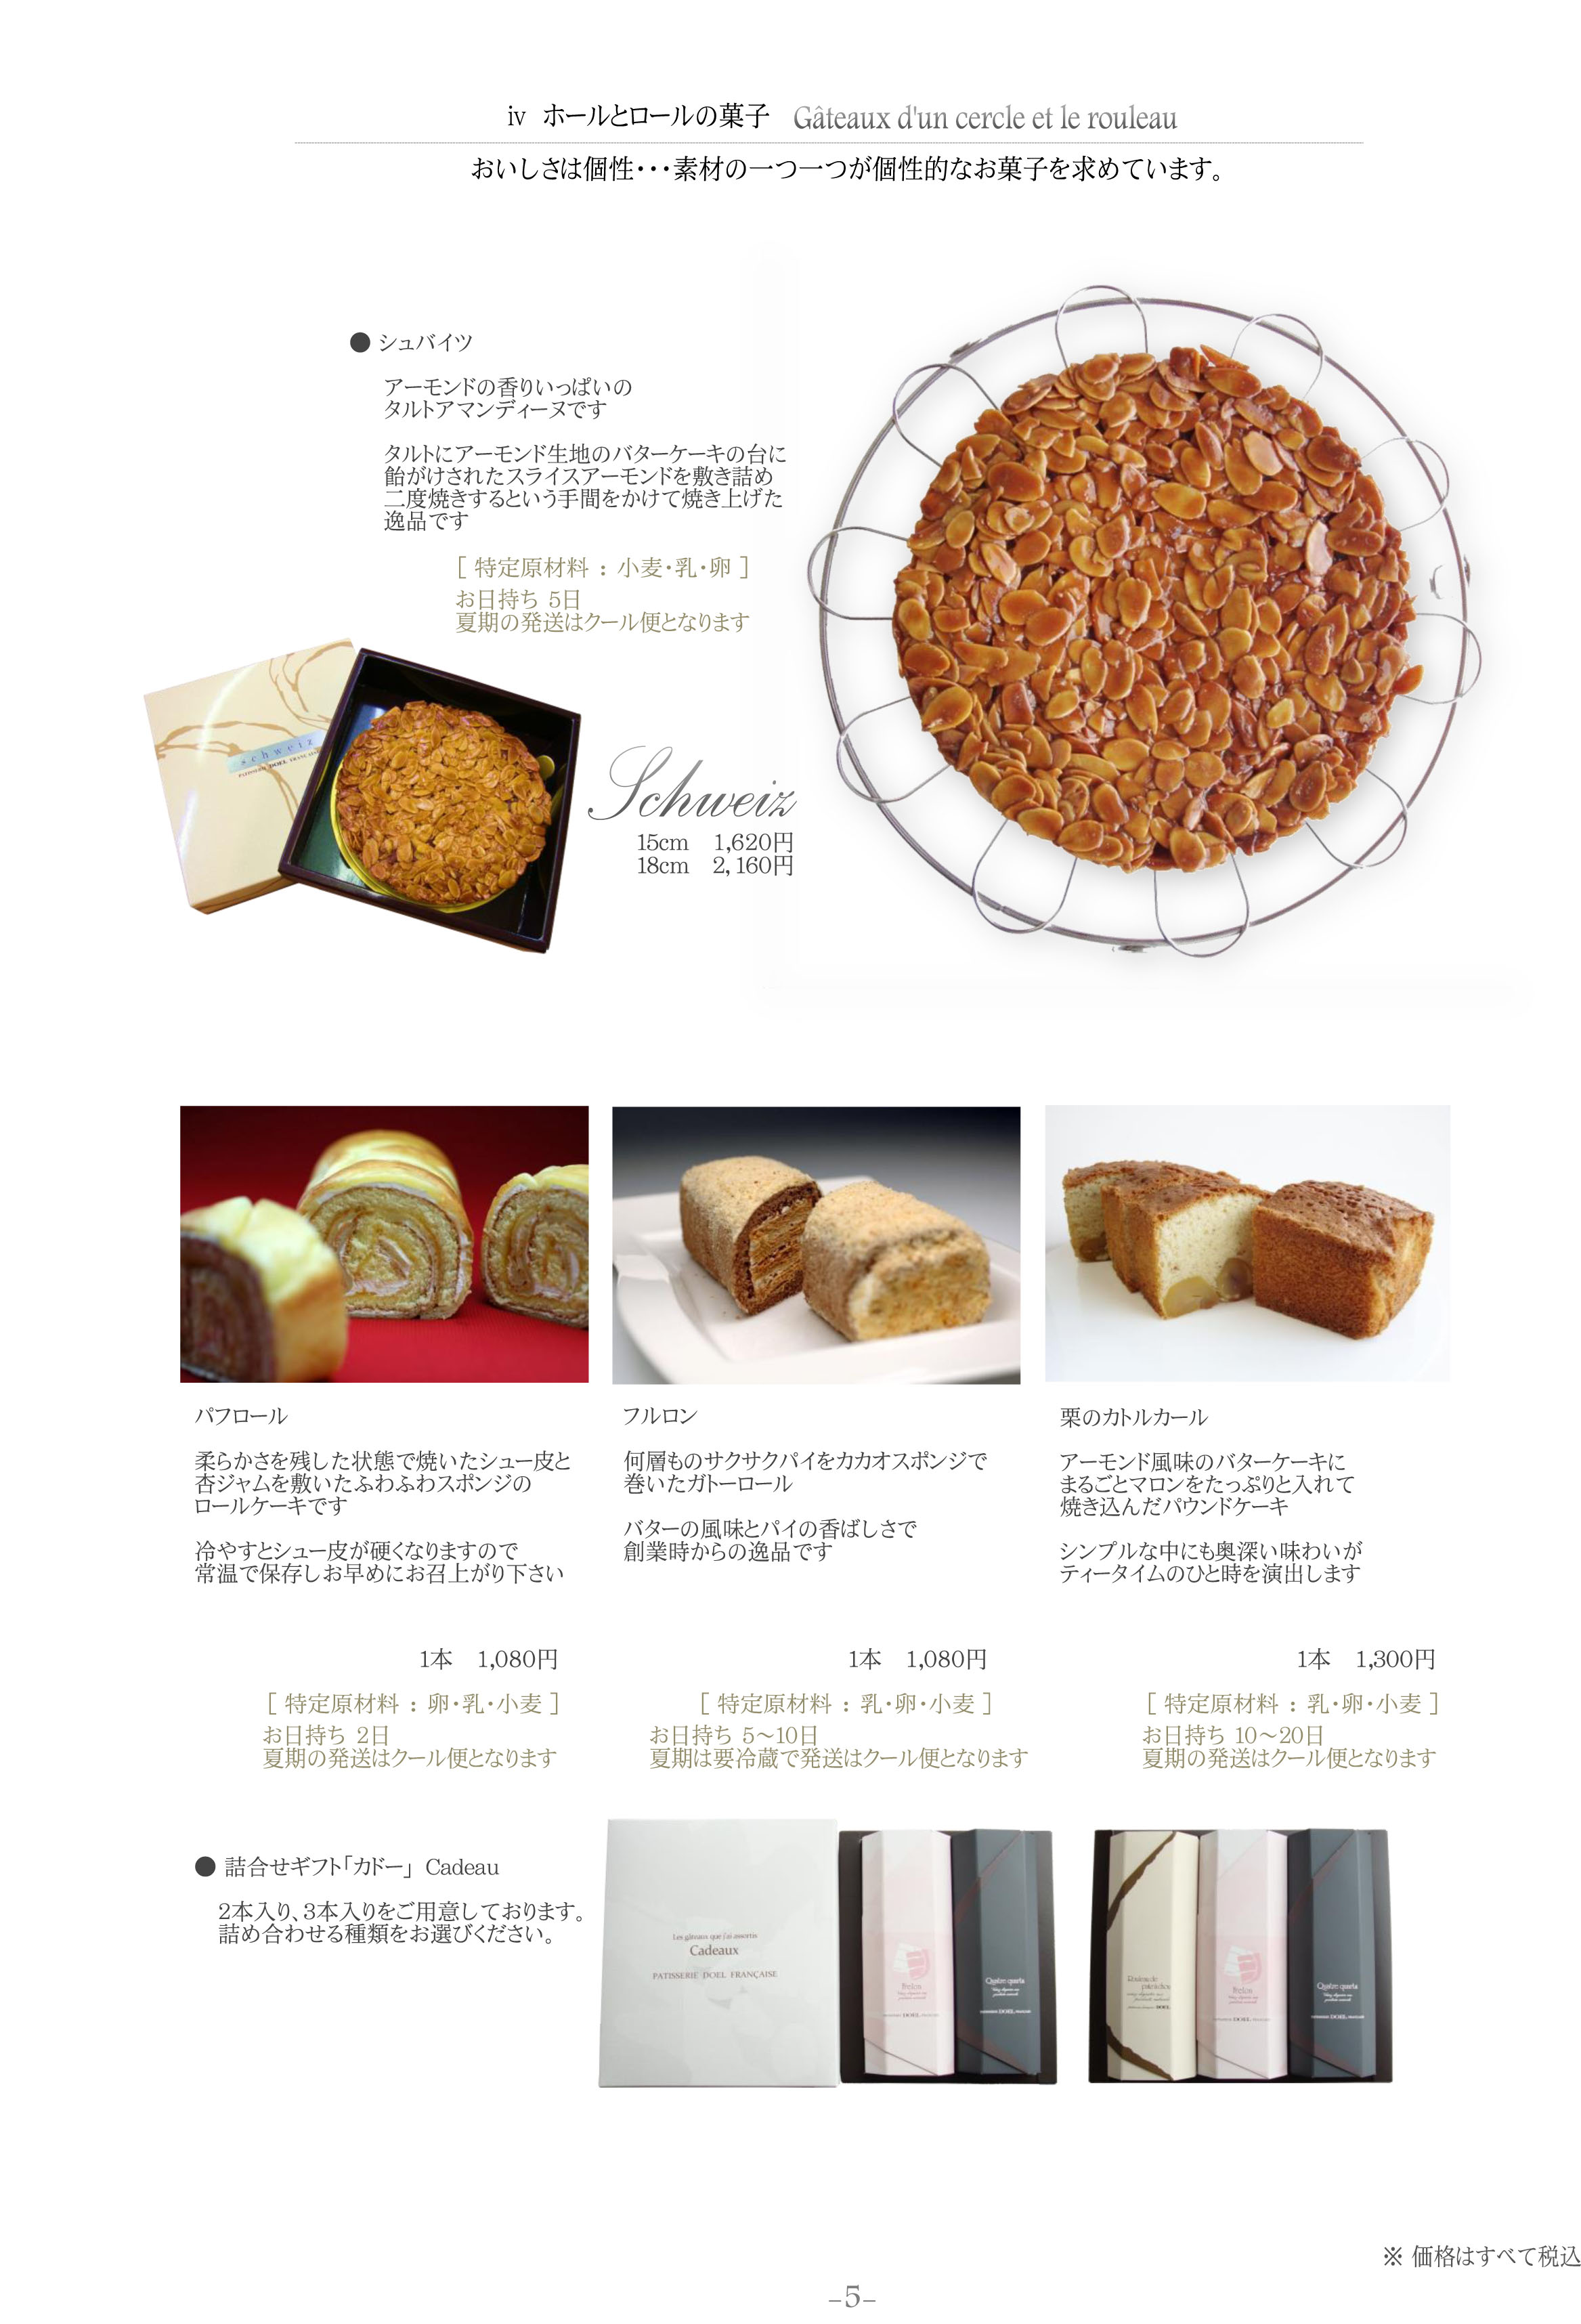 171208 catalog_05